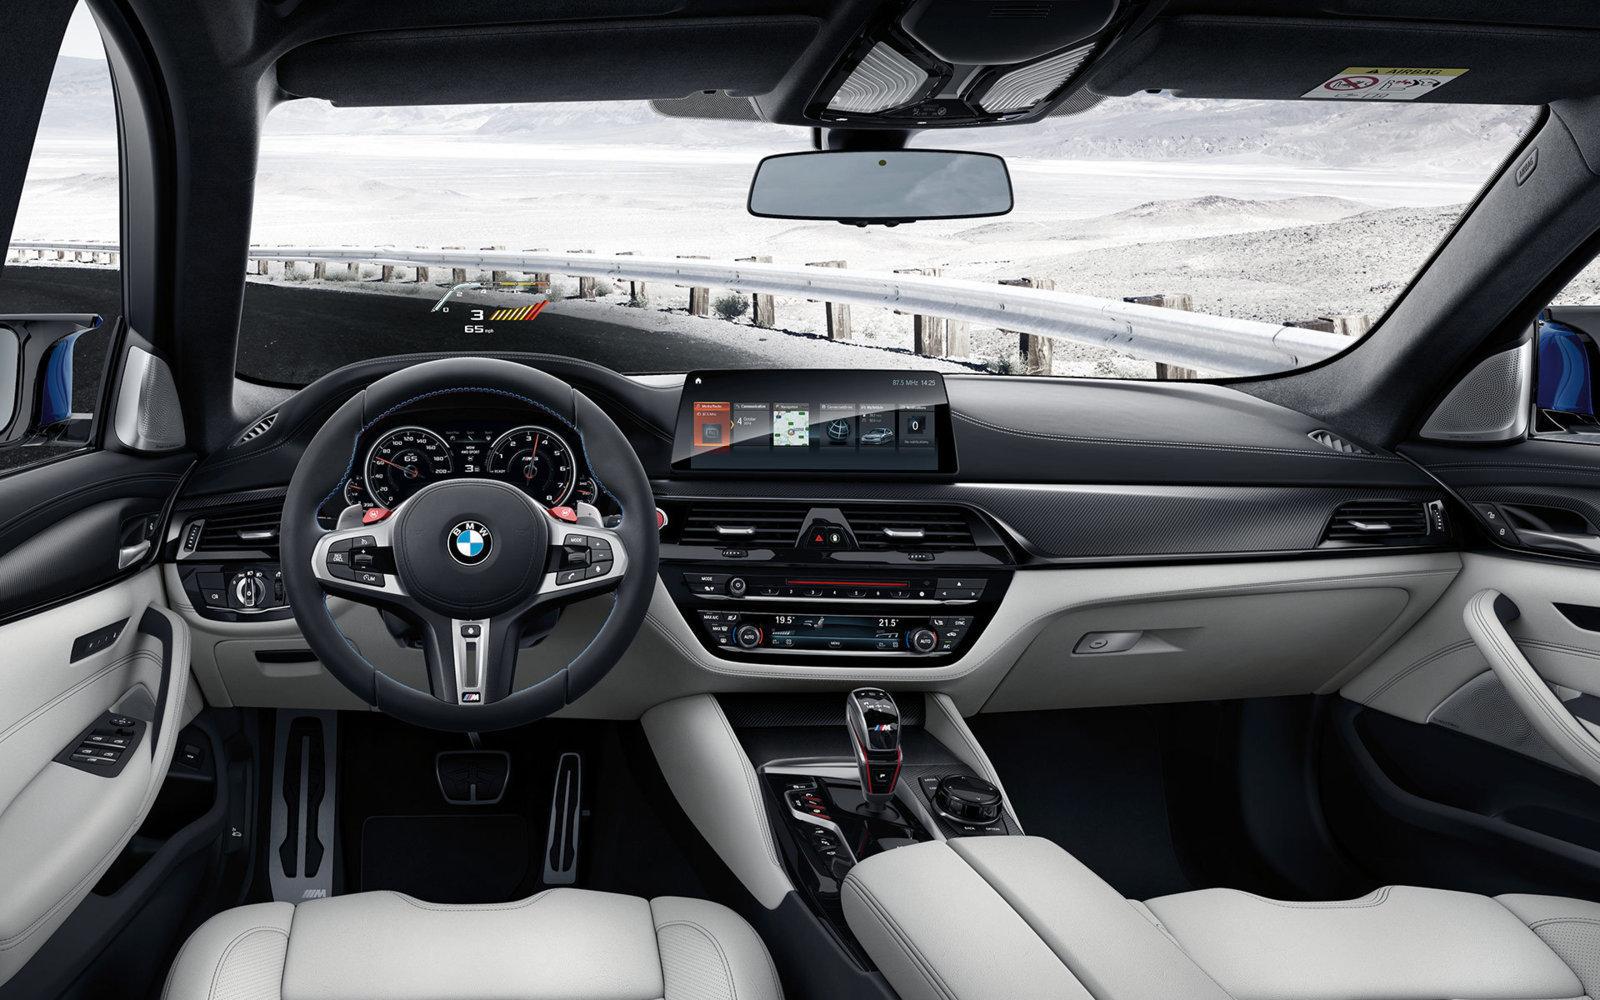 BMW-M5-2018-Wallpaper-10.jpg